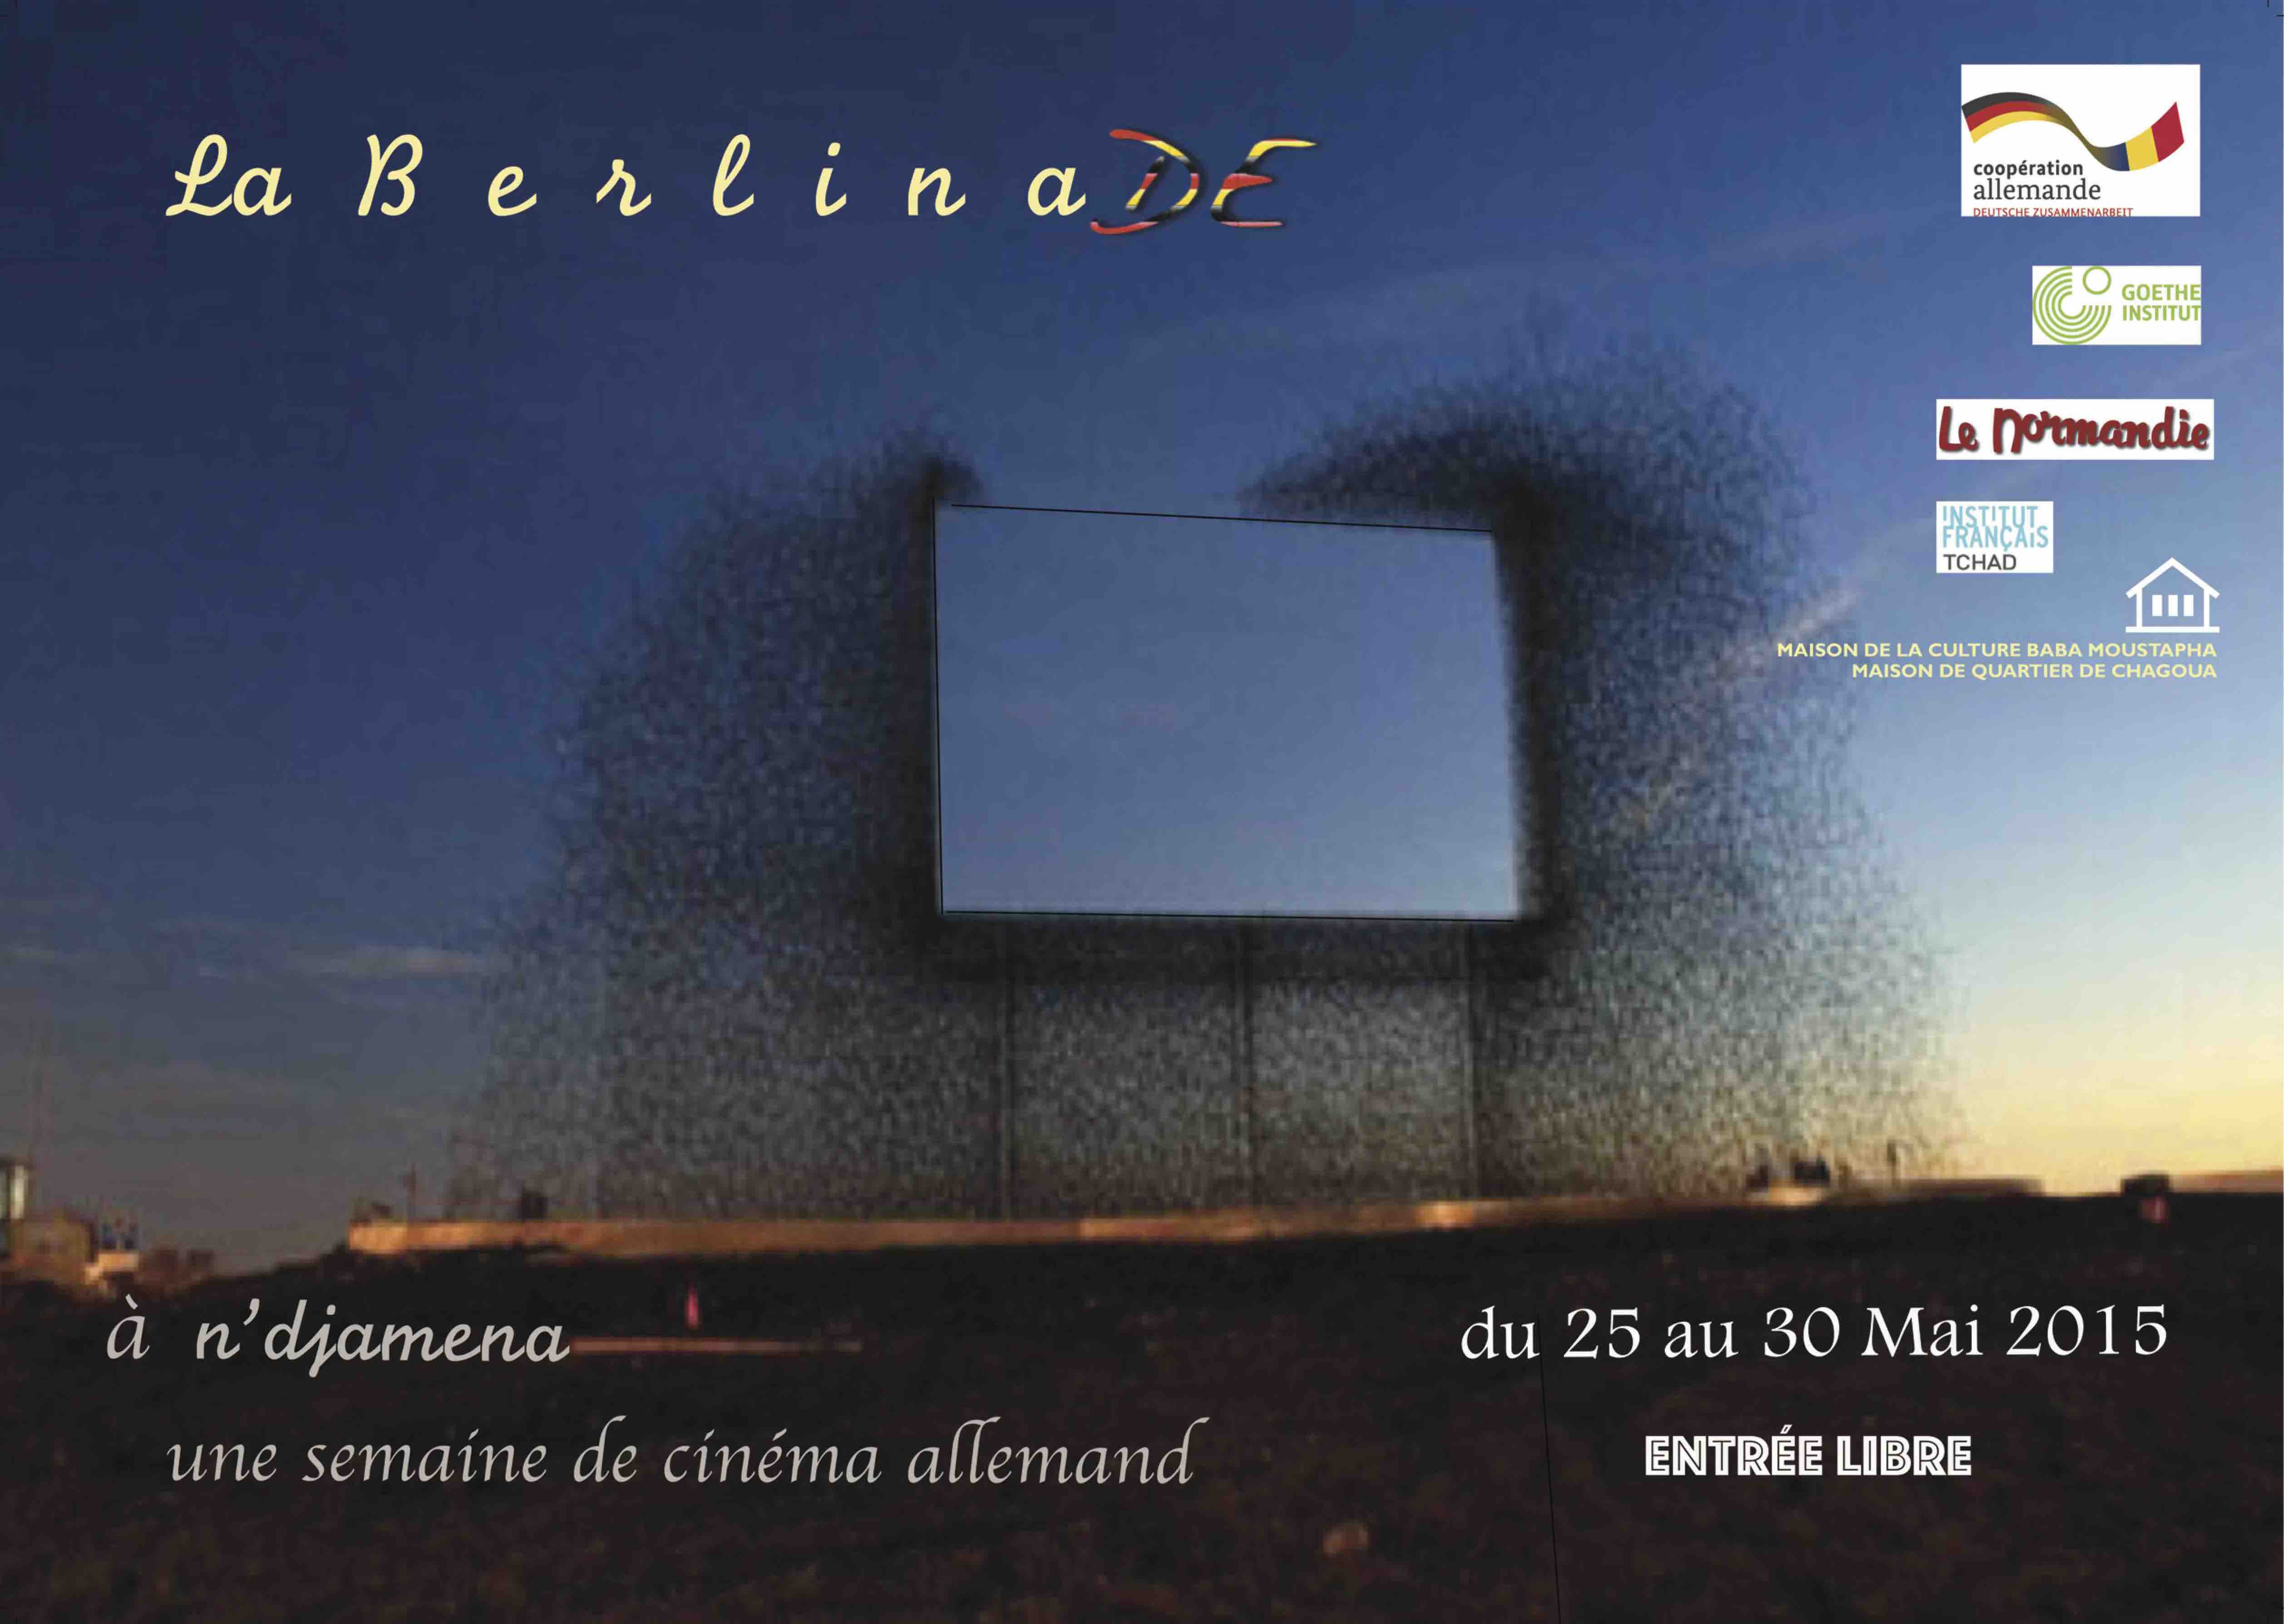 Cinéma Normandie : au programme cette semaine La Berlinade 2015 à N'Djamena